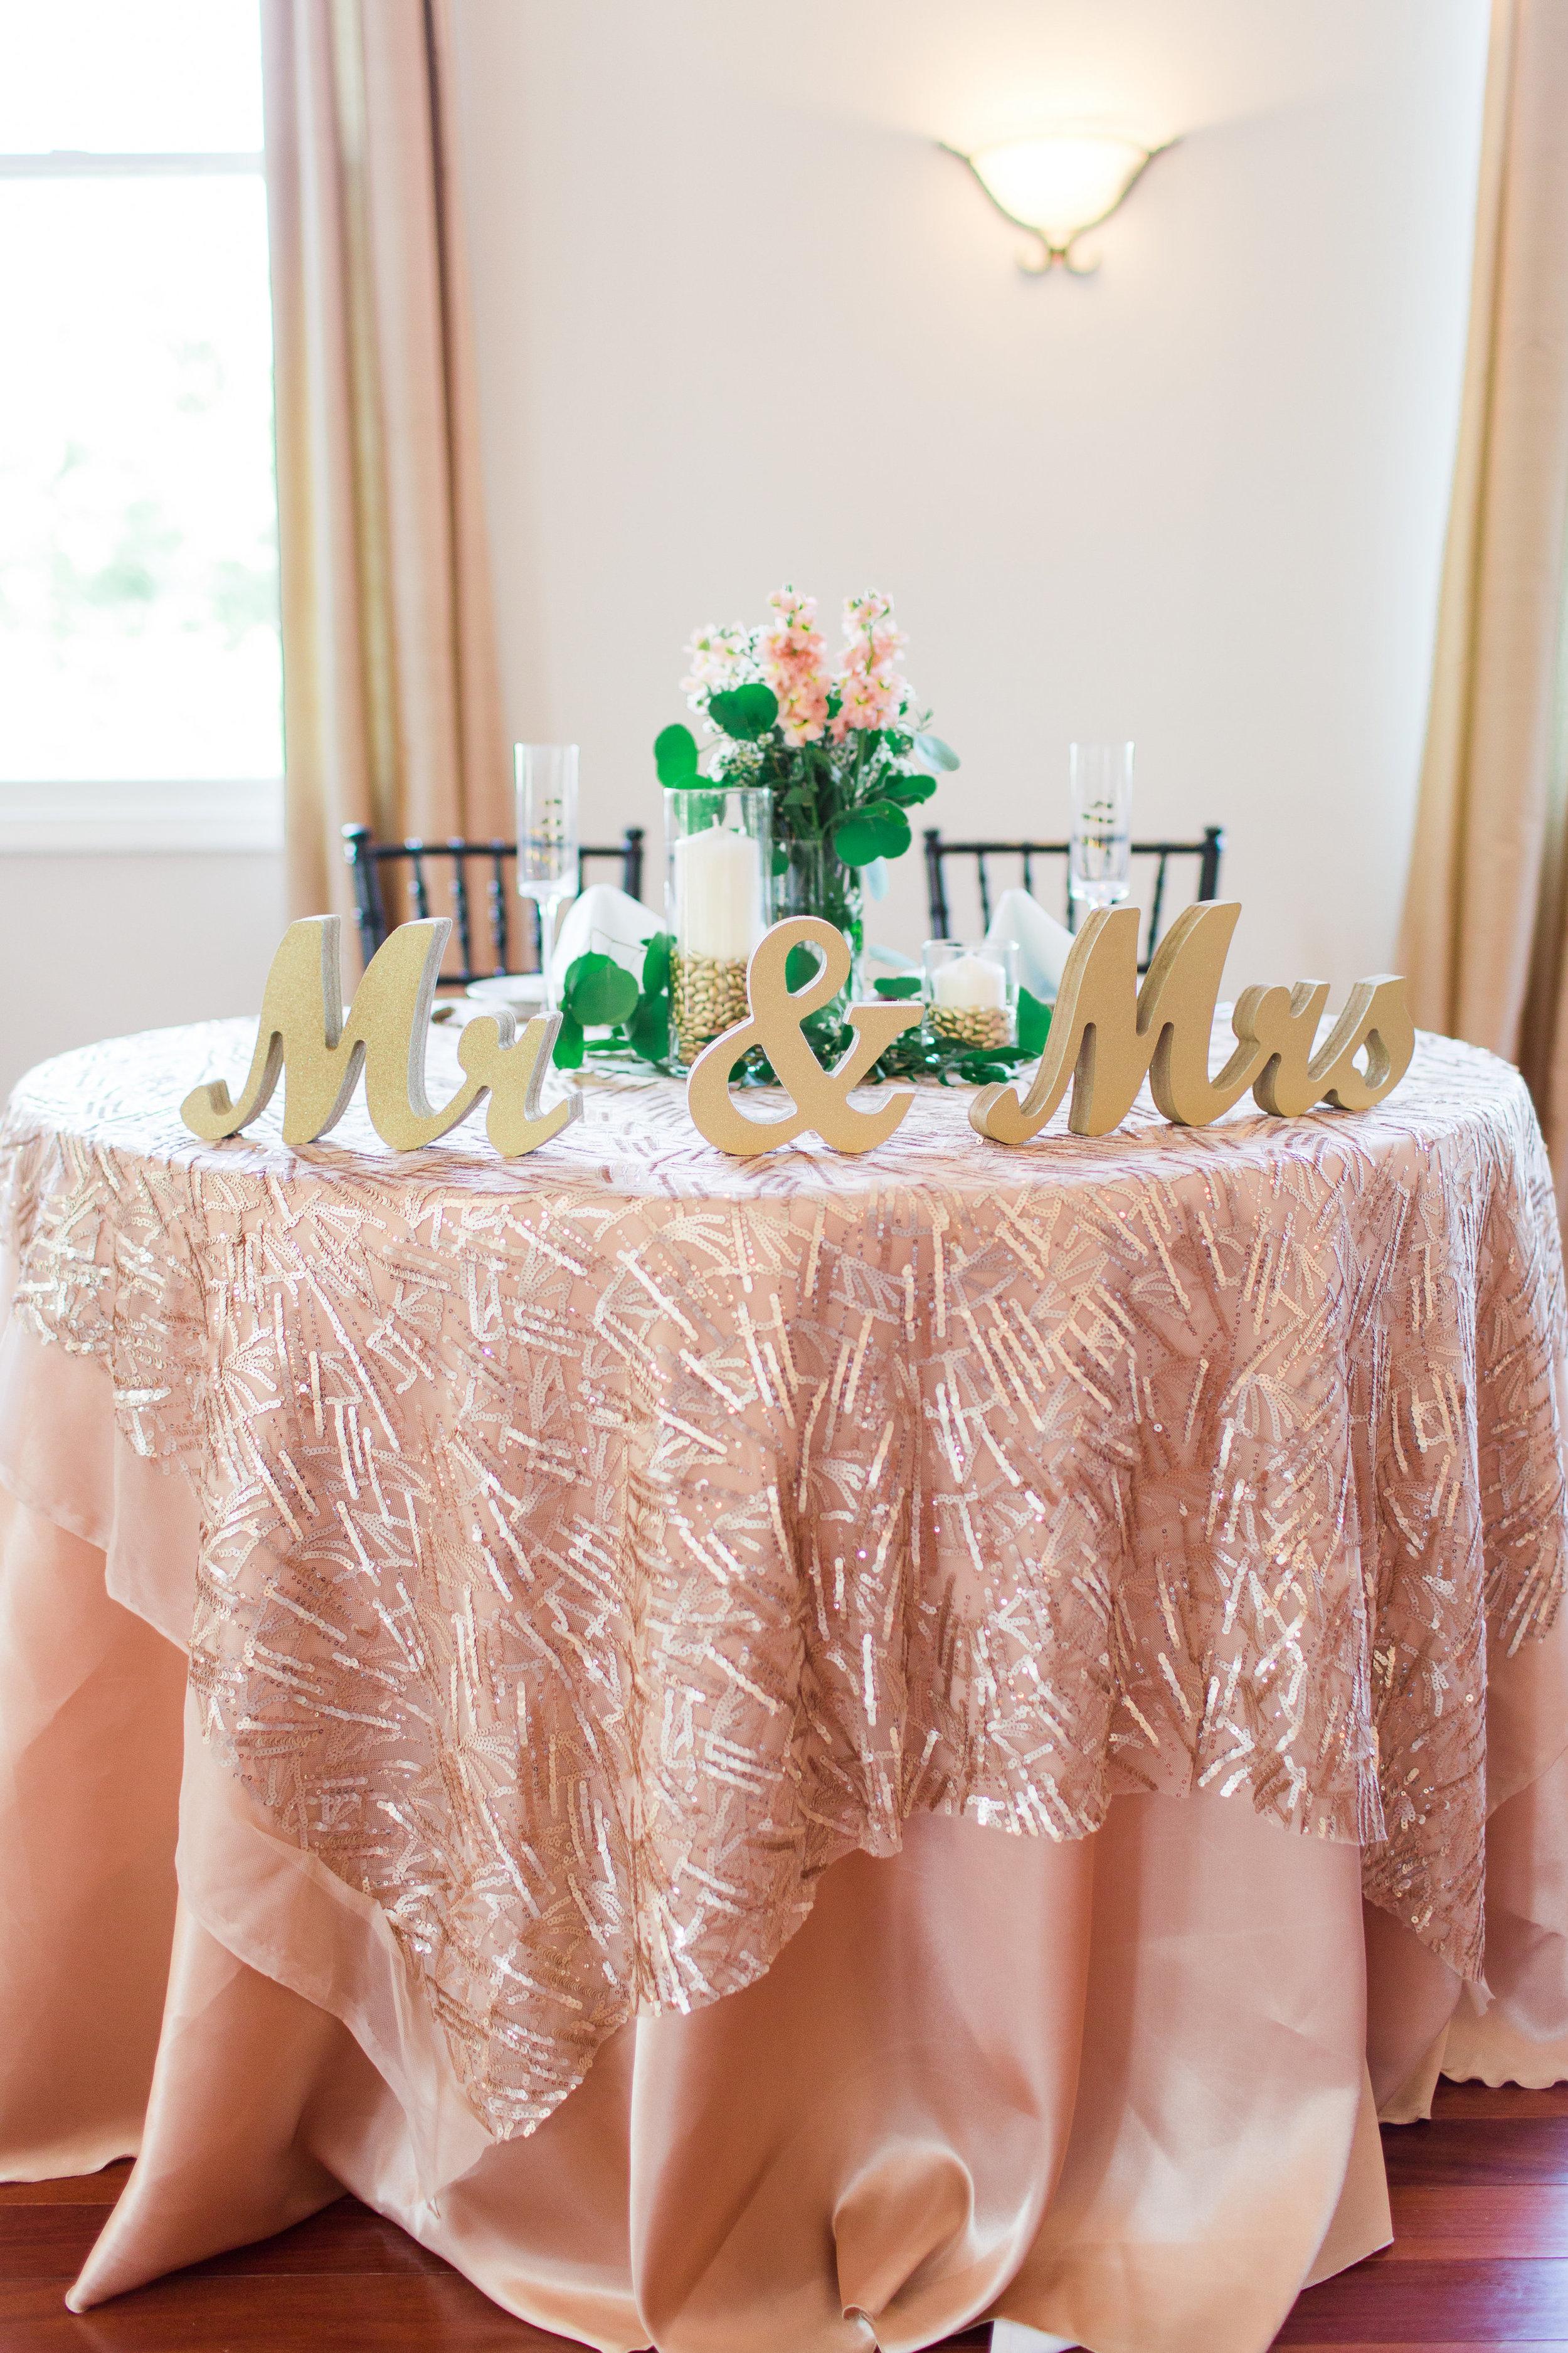 Plantation-On-Sunnybrook-Wedding-Photos_Roanoke-Wedding-Photographer_Jessica-Gre-0027.jpg